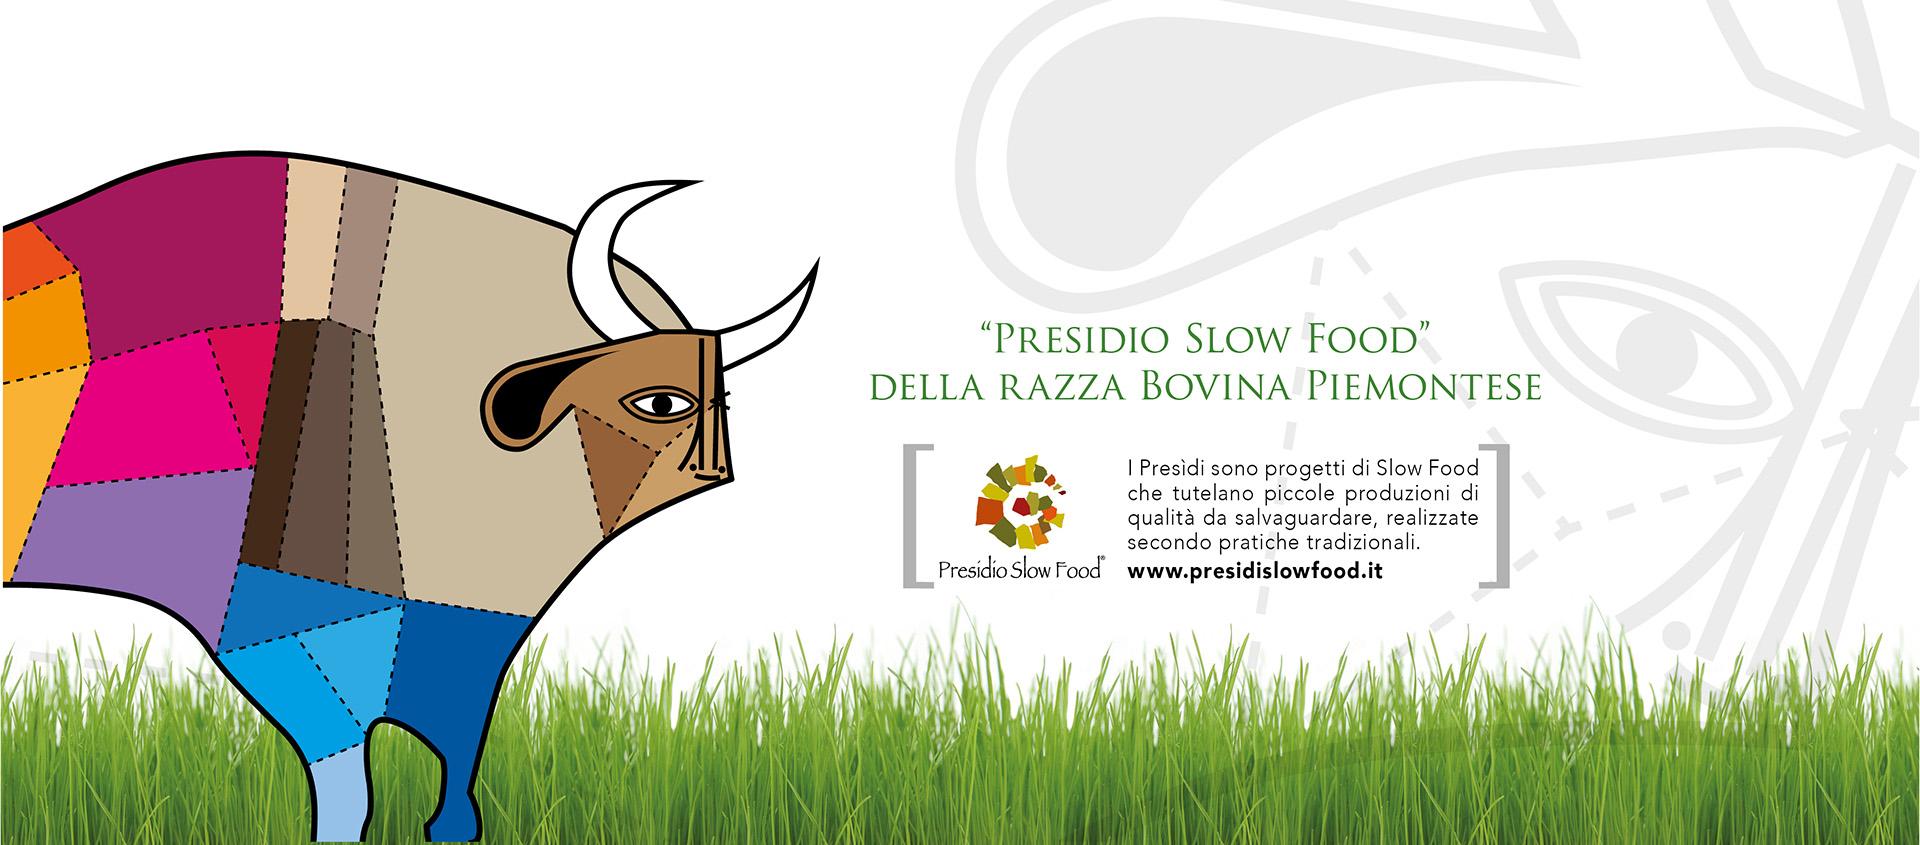 La Granda primo Presidio Slow Food della Razza Piemontese